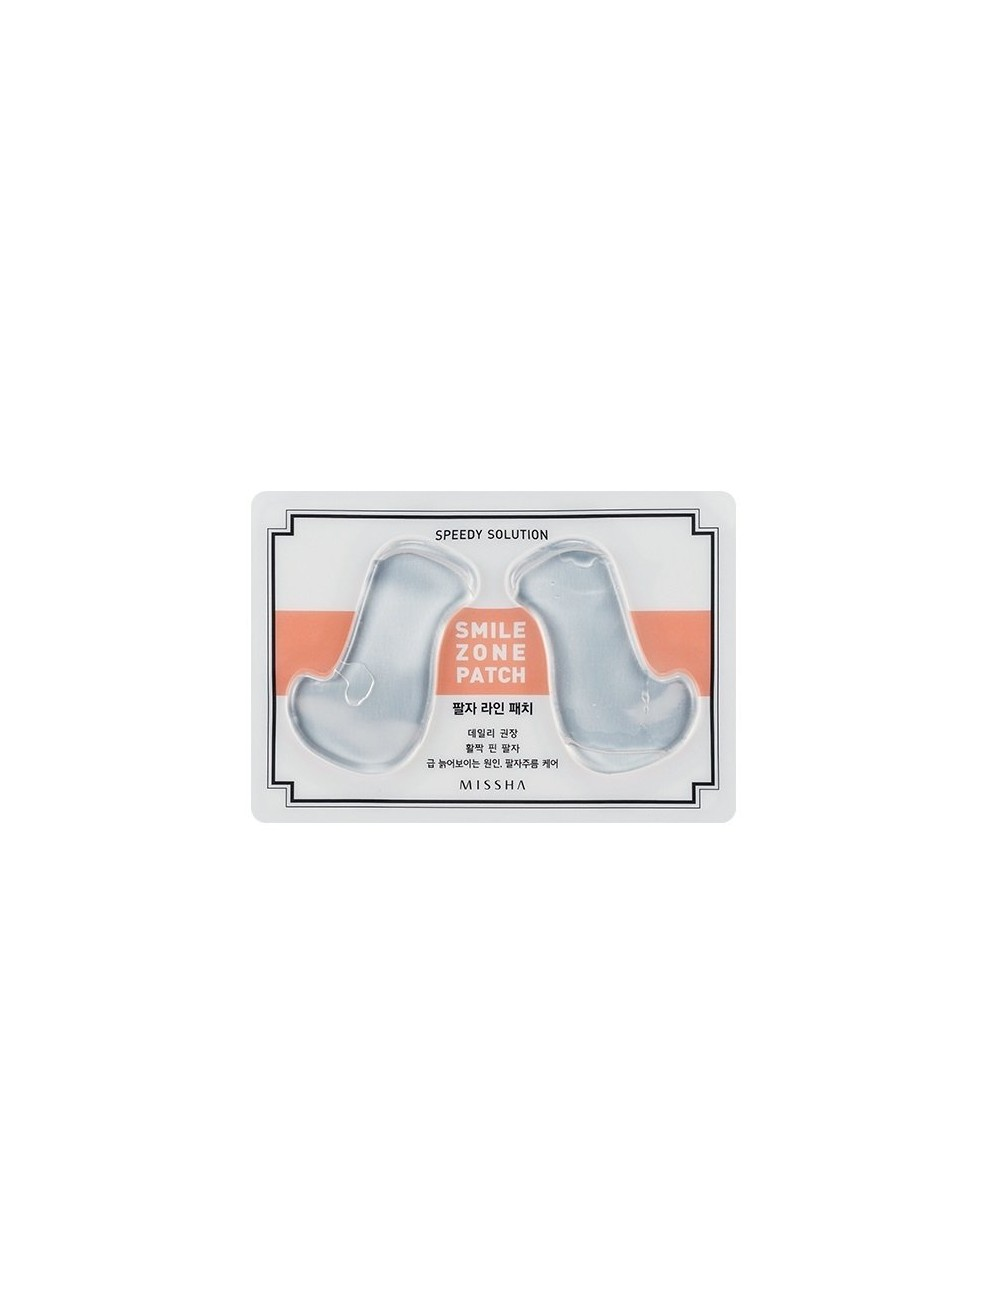 Parches Anti-arrugas del Surco Nasogeniano  MISSHA Speedy Solution Smile Zone Patch